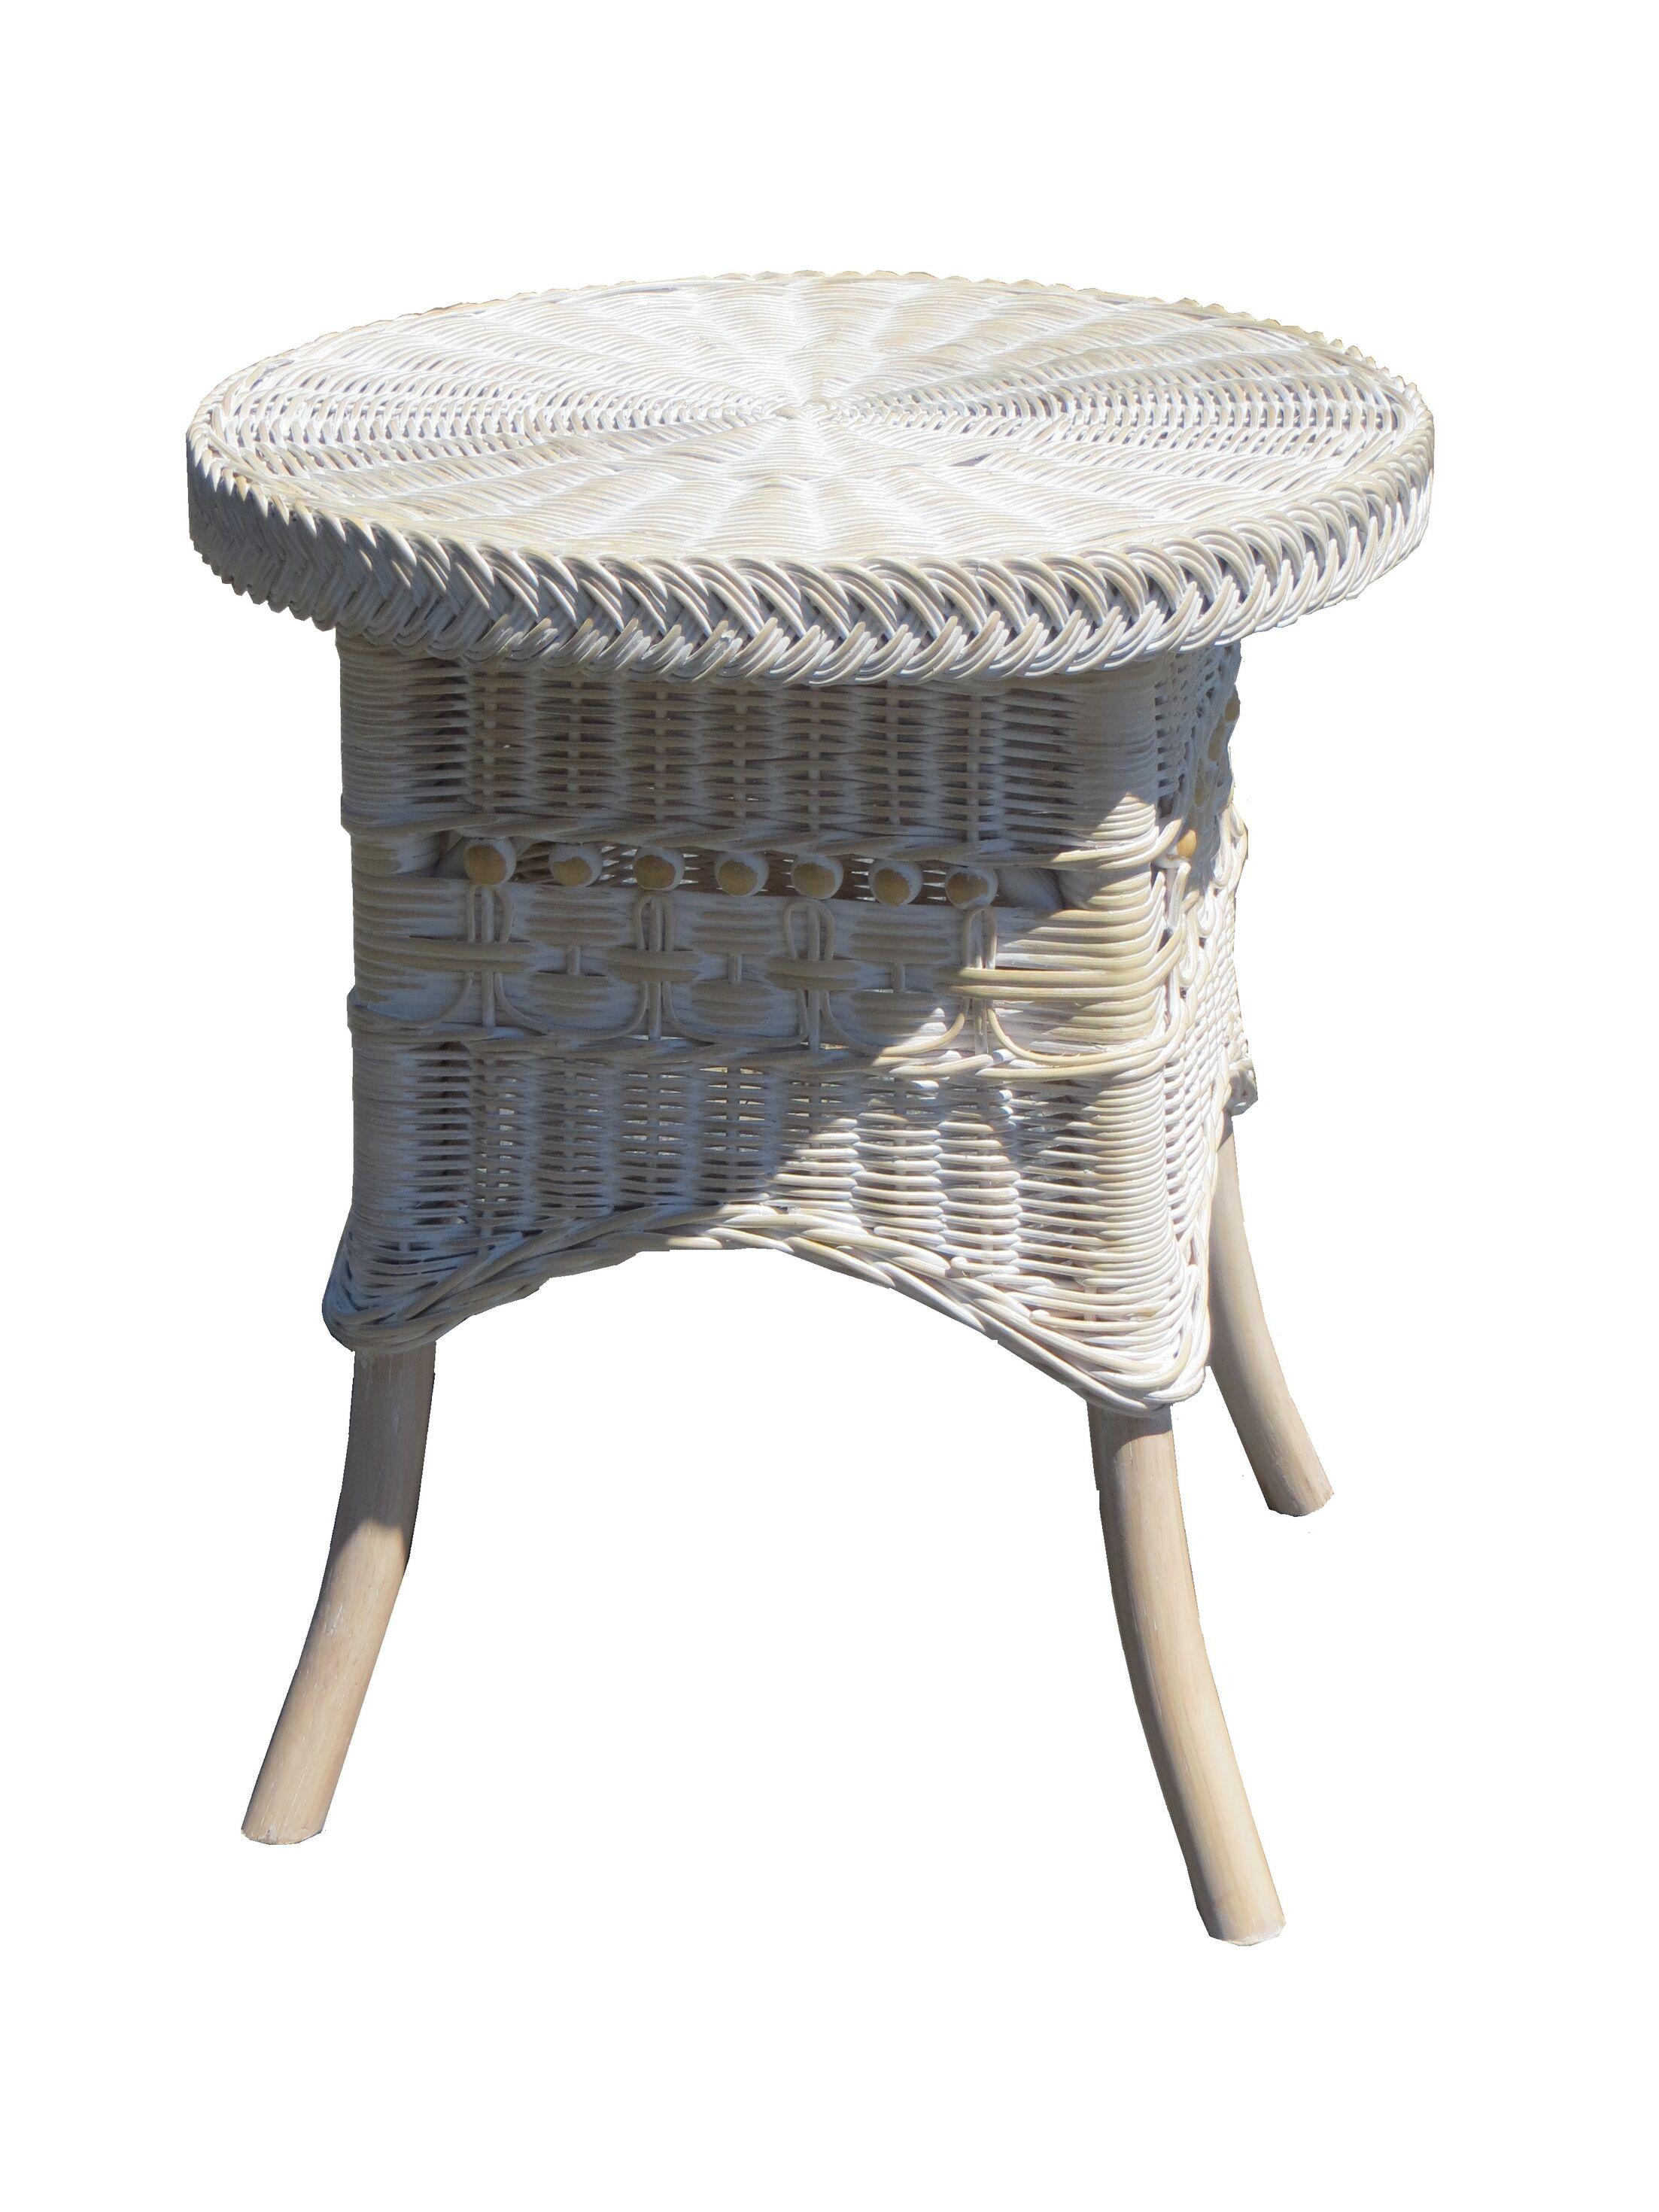 End Table Color: Whitewash, Size: 19